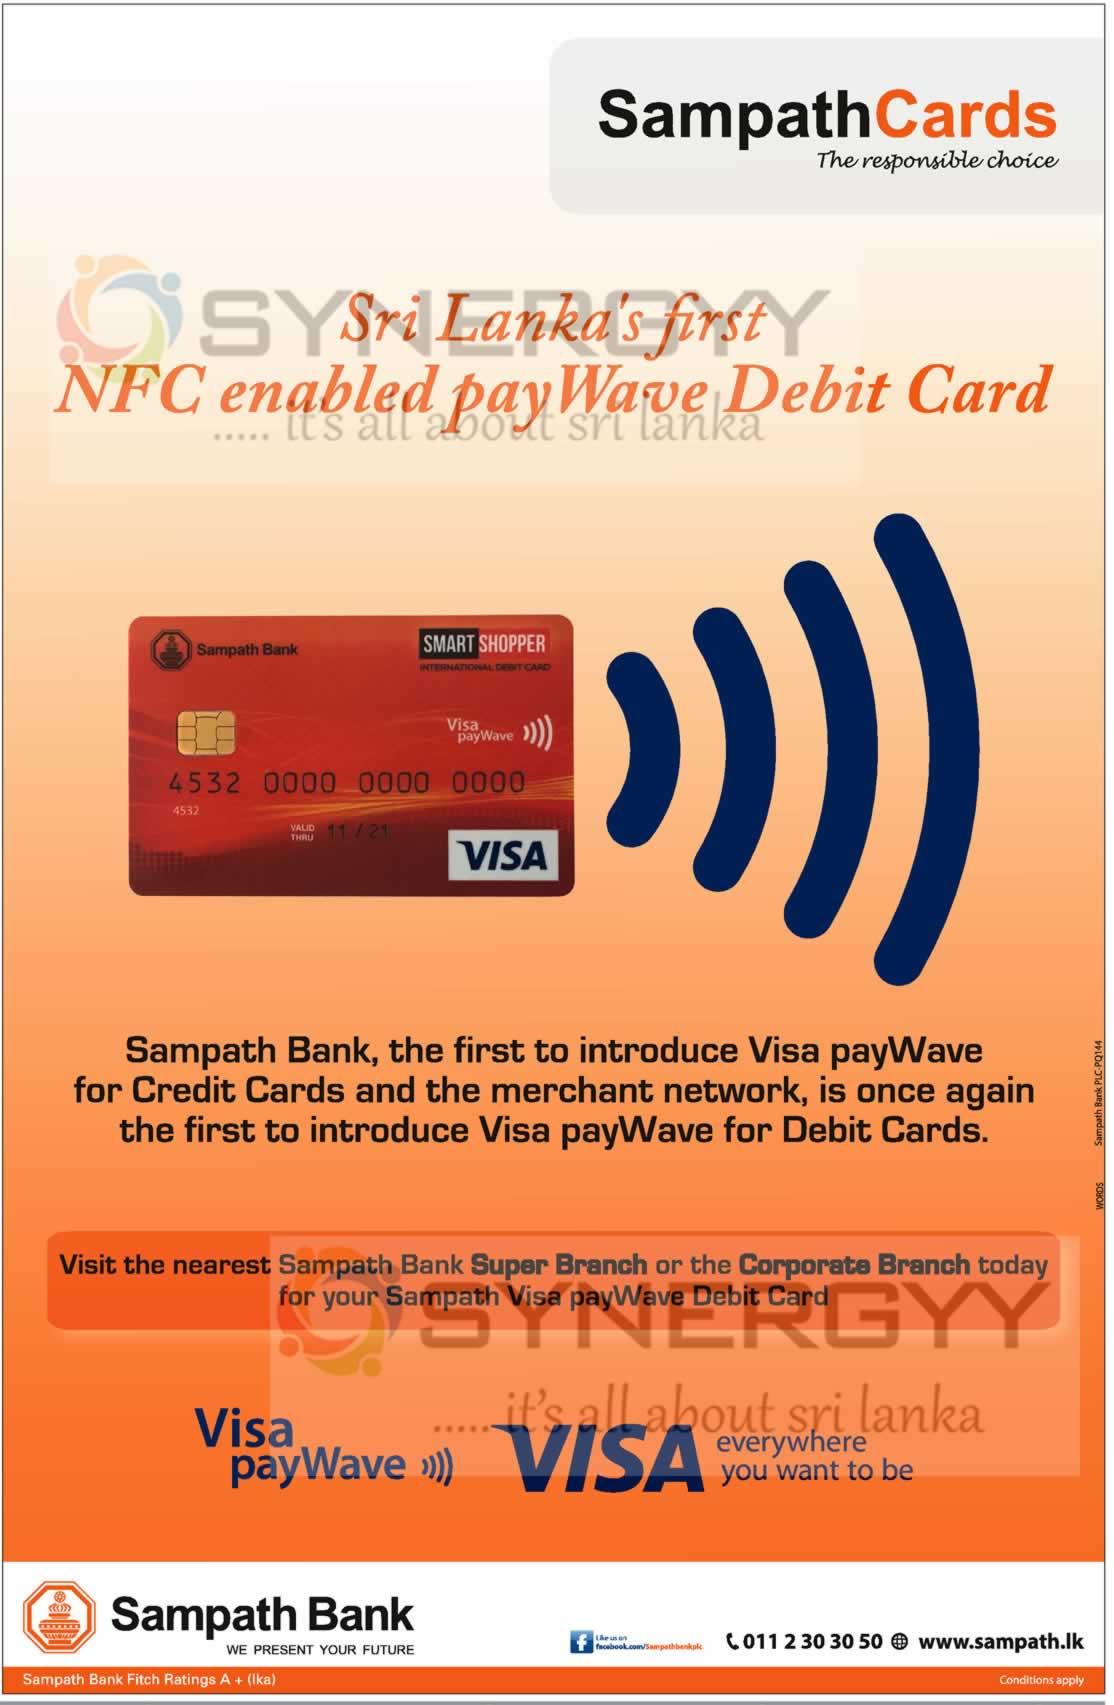 Sampath Bank Visa Paywave Debit Card Only From Sampath